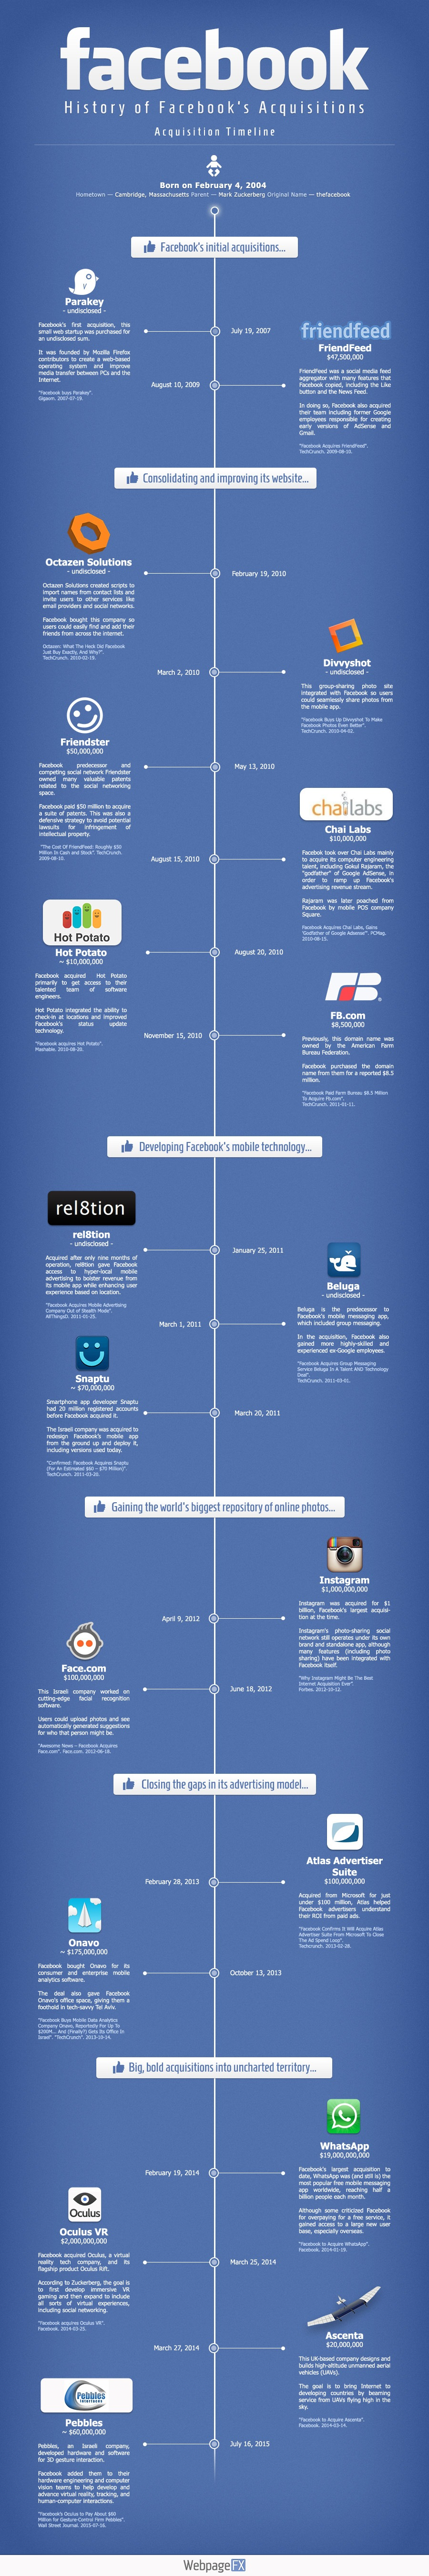 facebooks-purchasing-history